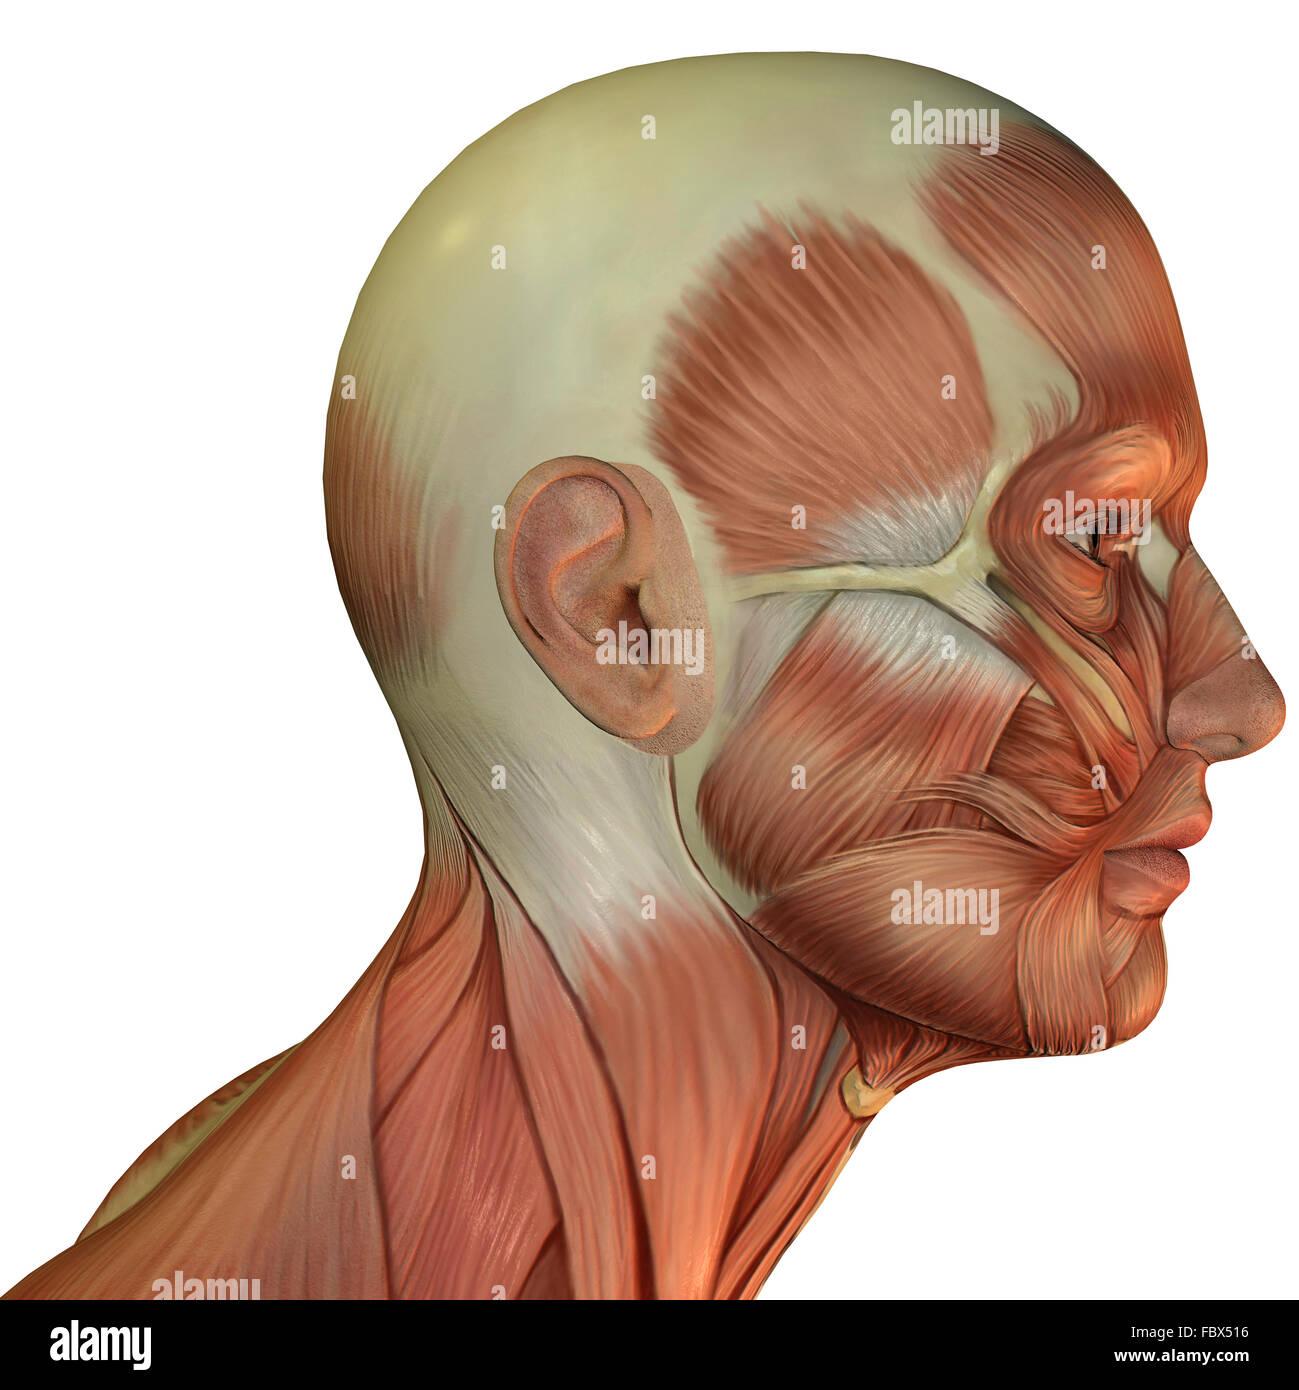 La estructura muscular de la cabeza Imagen De Stock